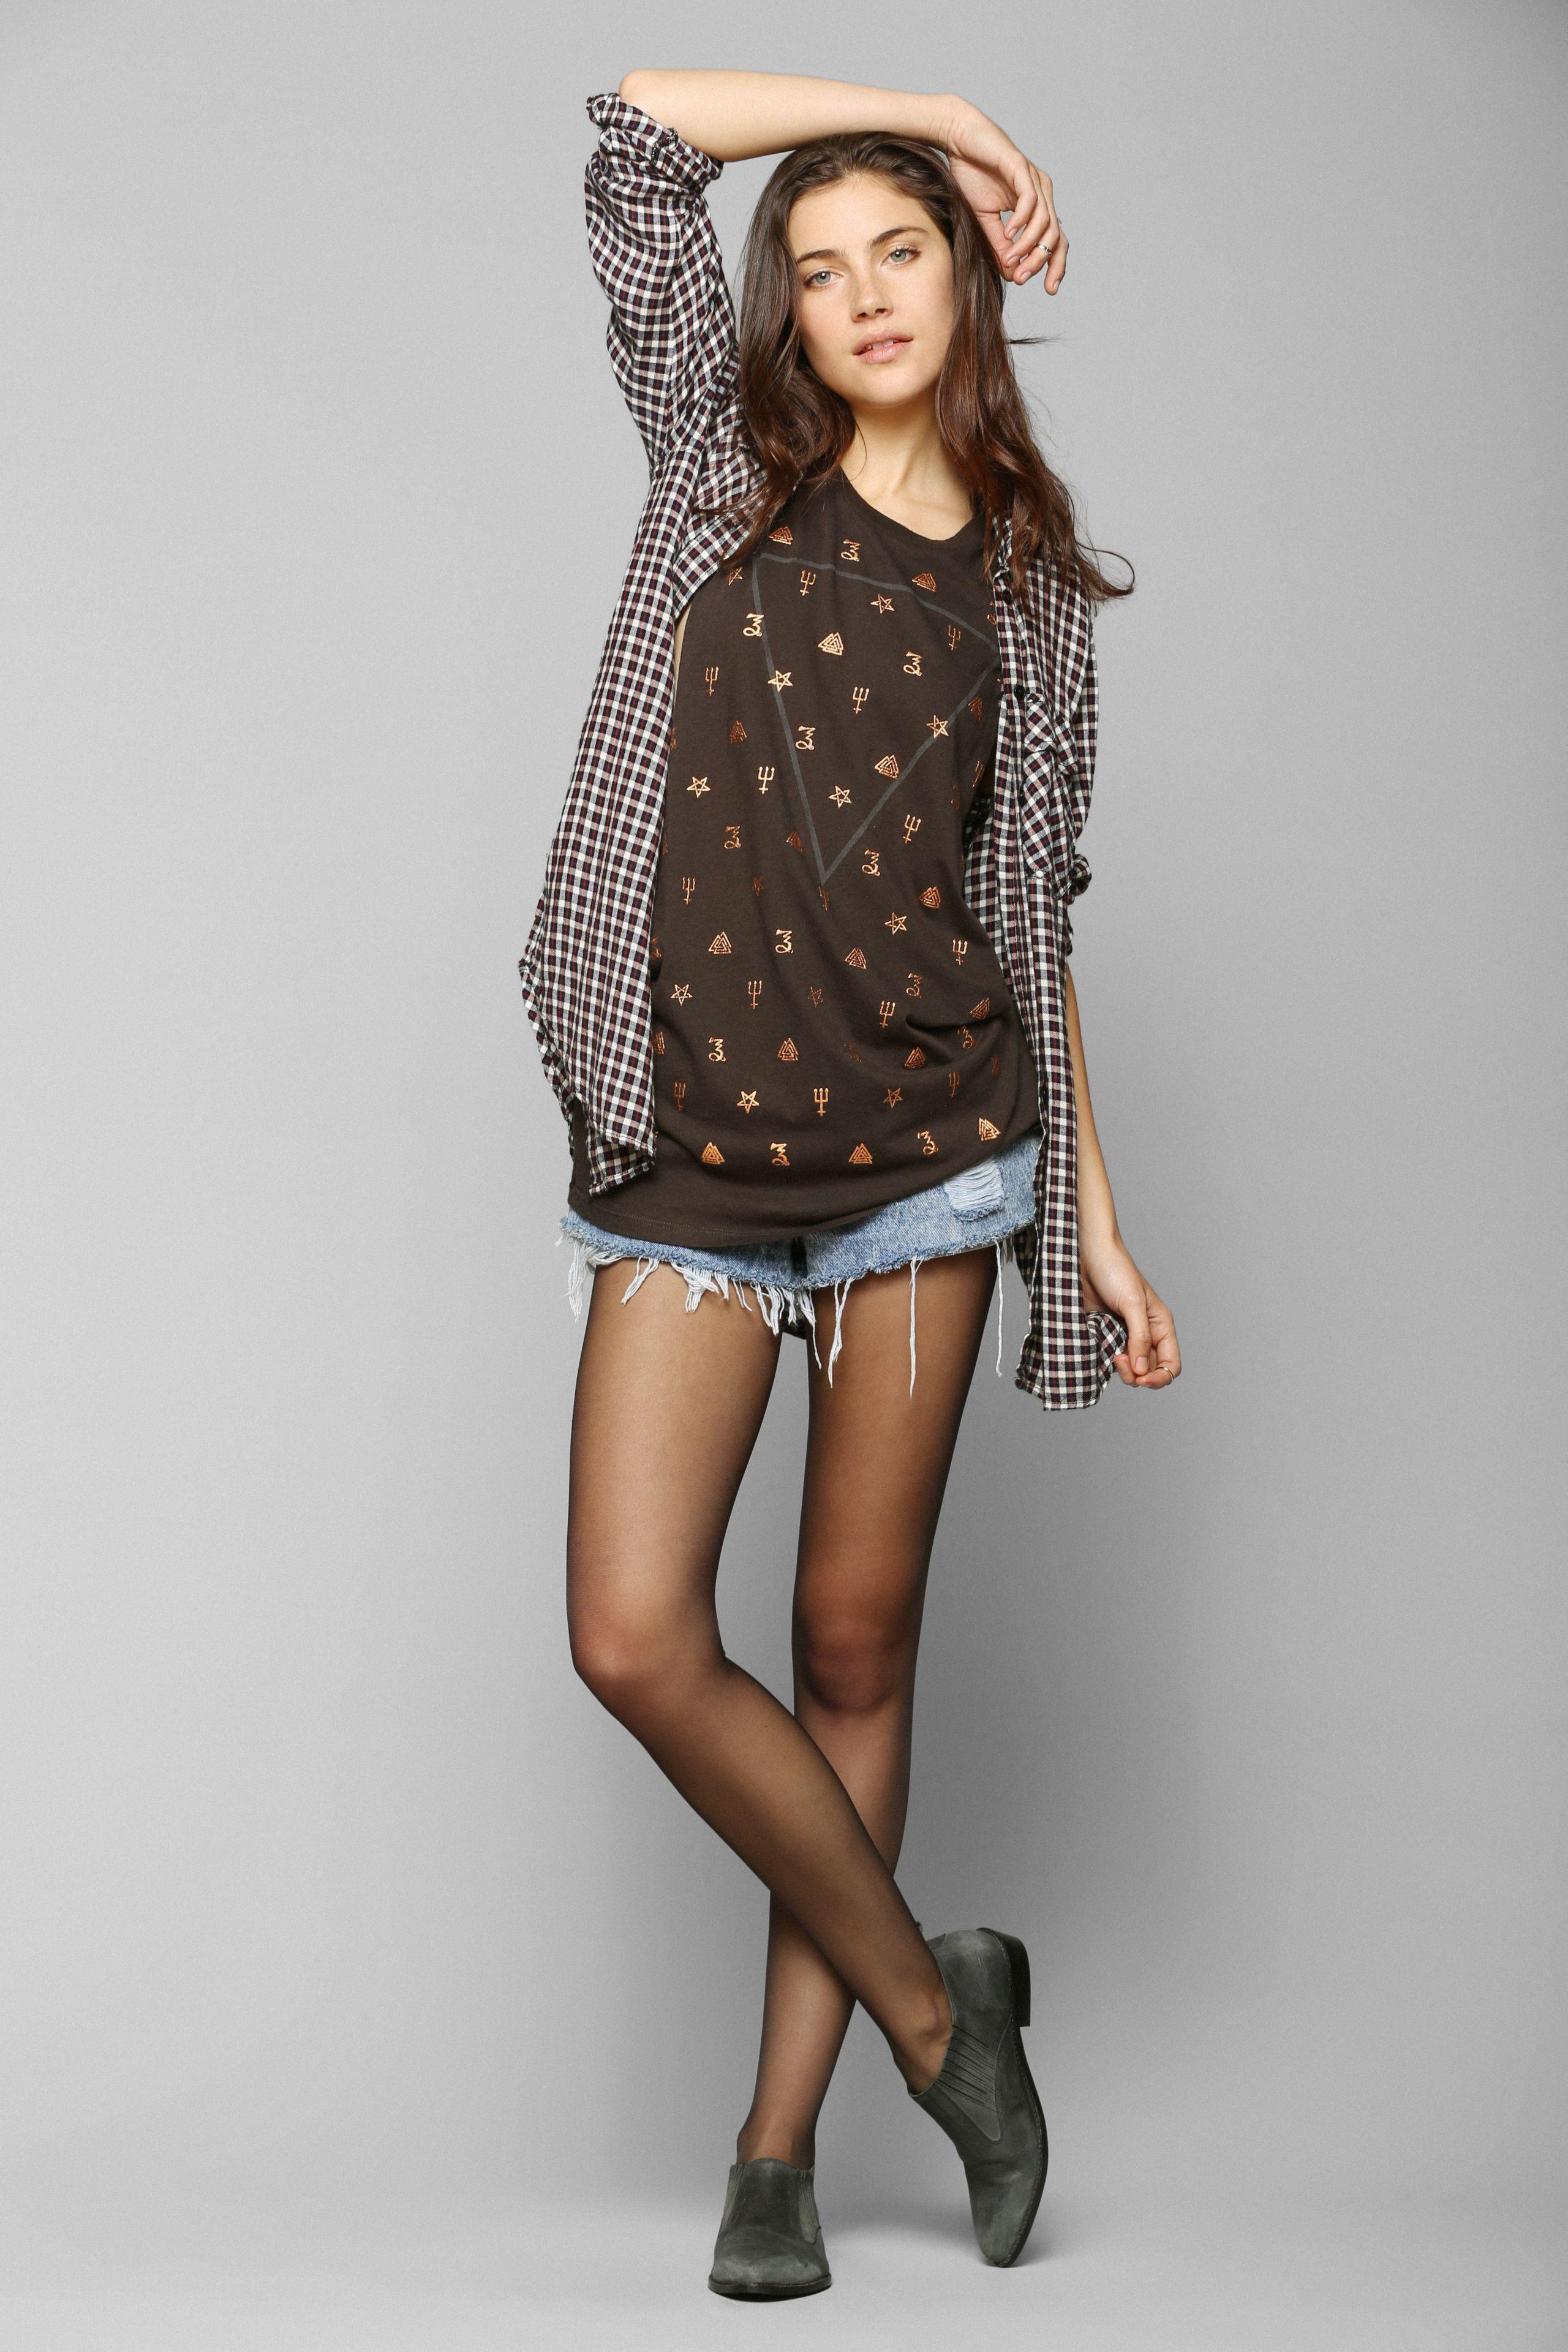 89cb897c | Fashion, Style, Clothes